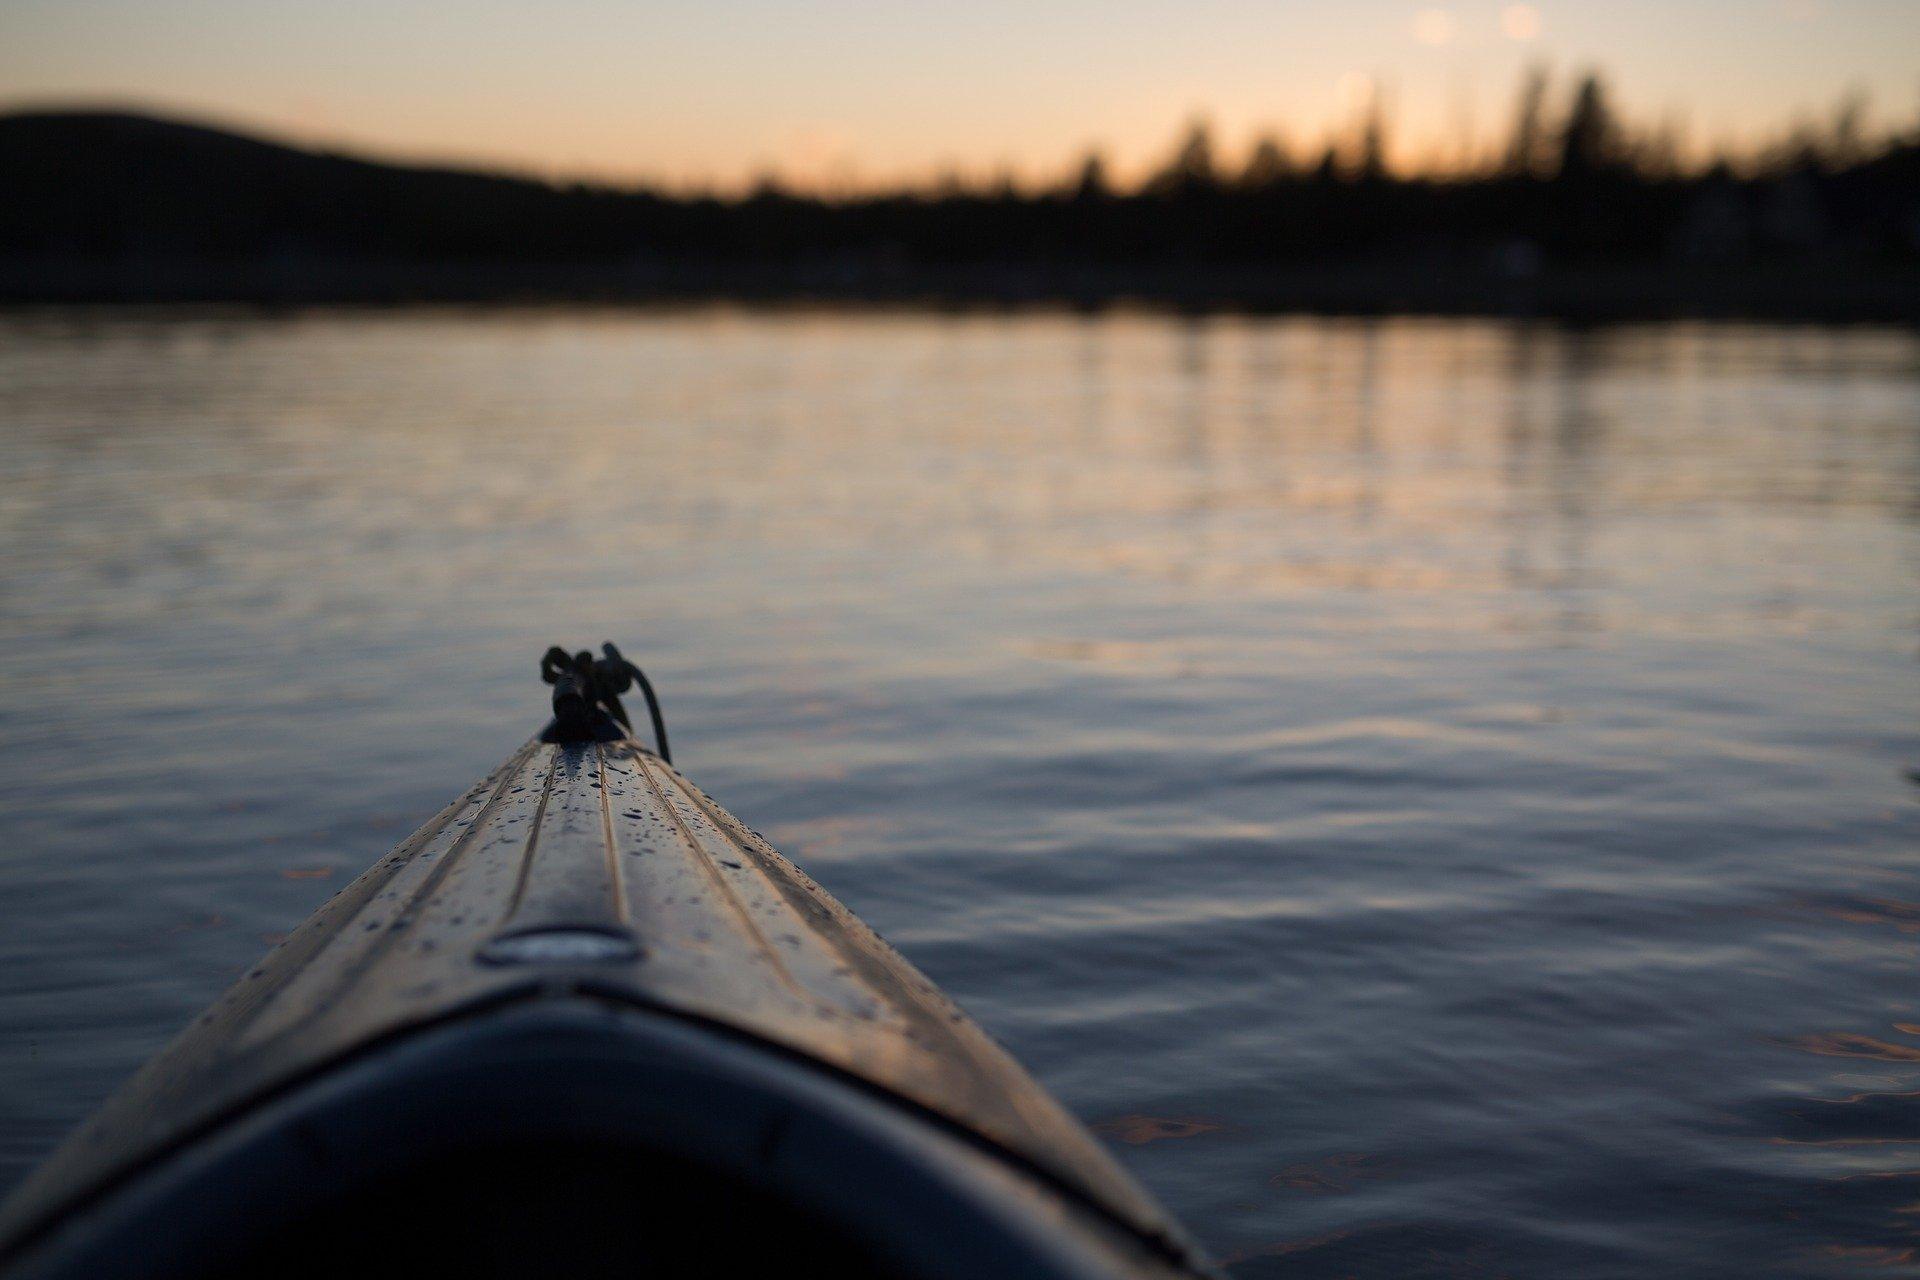 Canoa Bevano canoe kanu